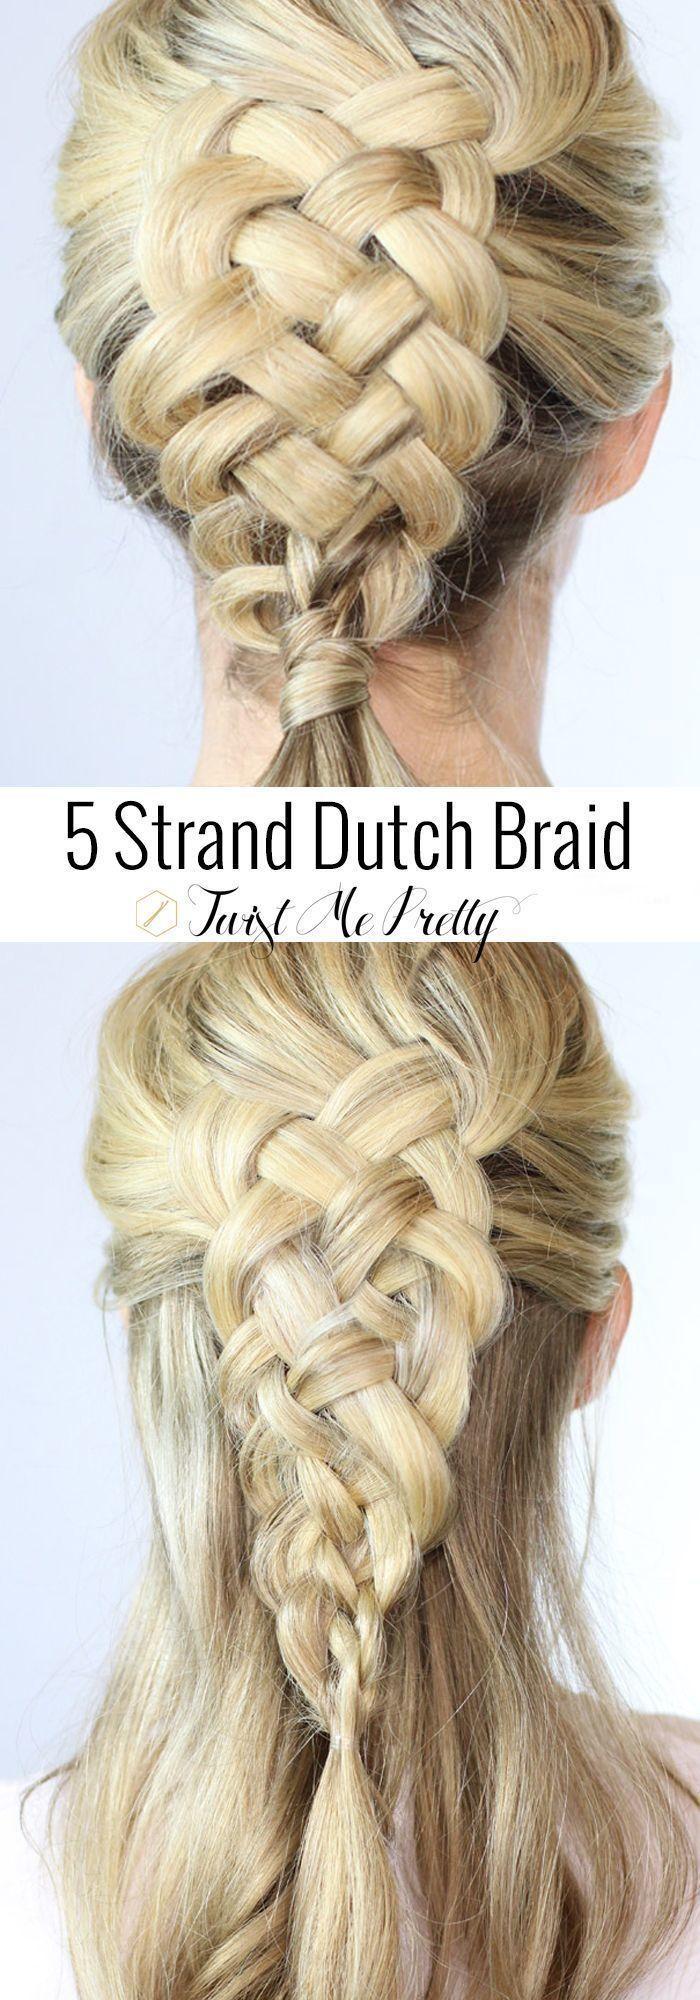 The 5-Strand Dutch Braid